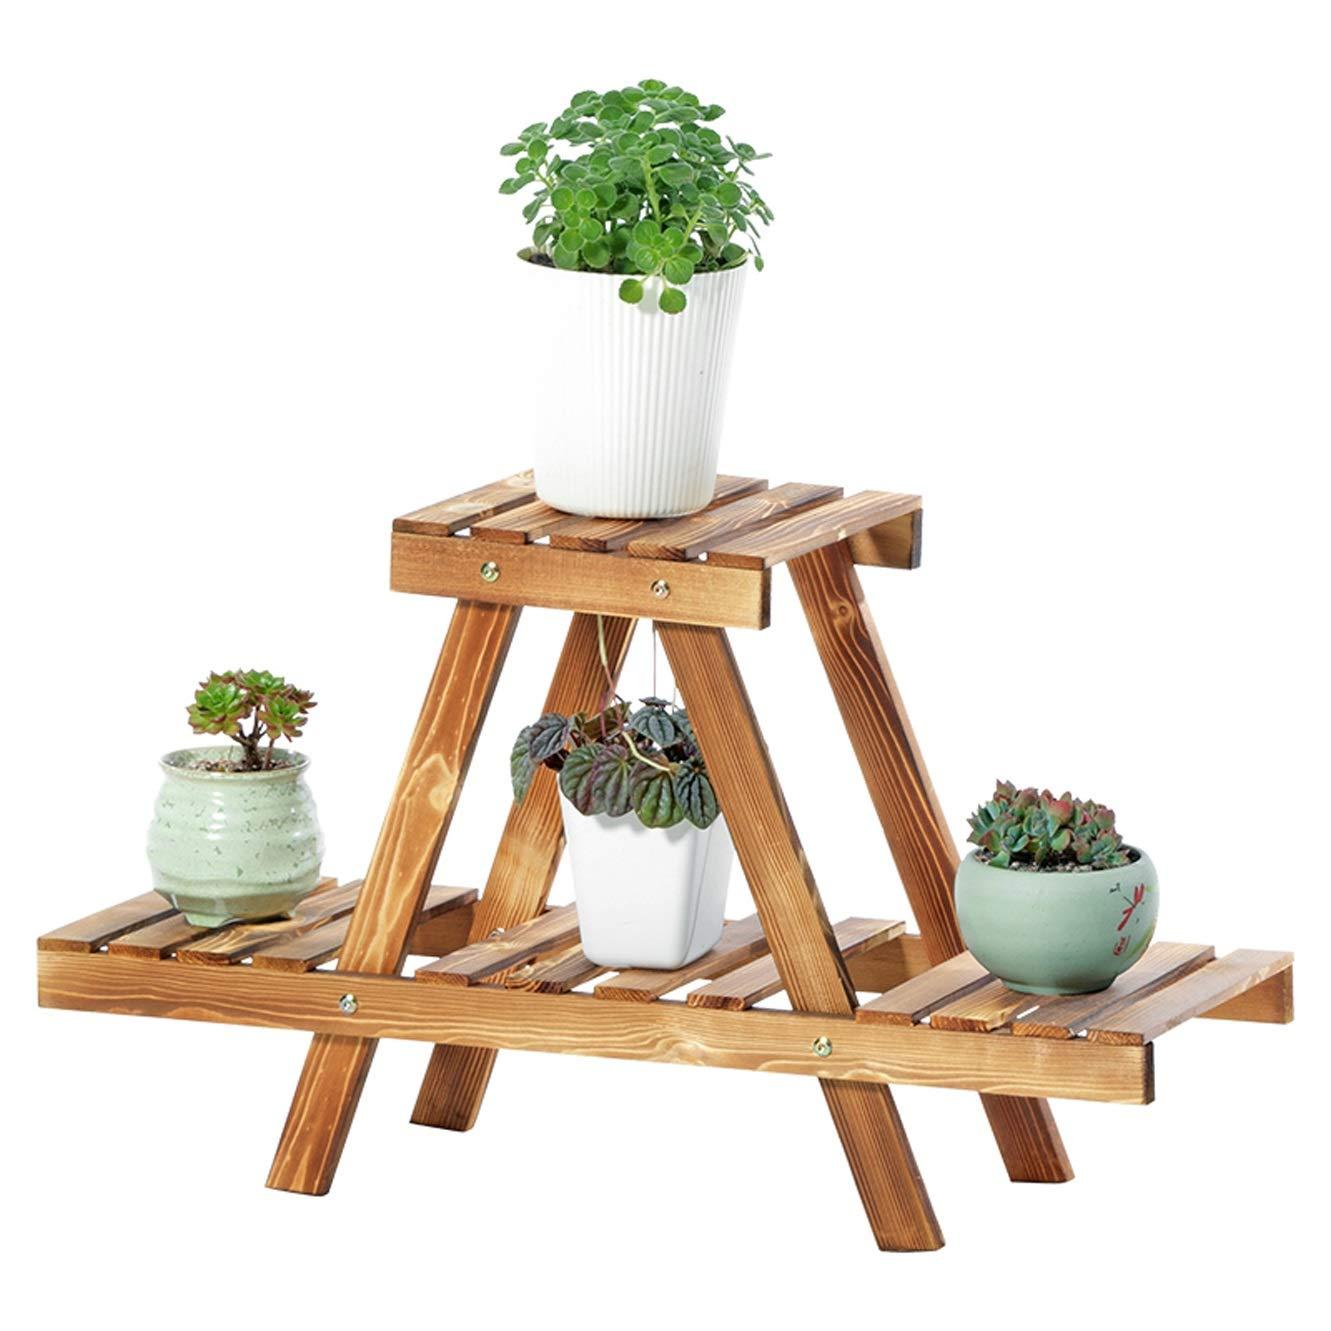 Echotang Wooden Plant Stand for Home Garden Balcony Flower Display Shelf Ladder Rack 2-Tier, Brown